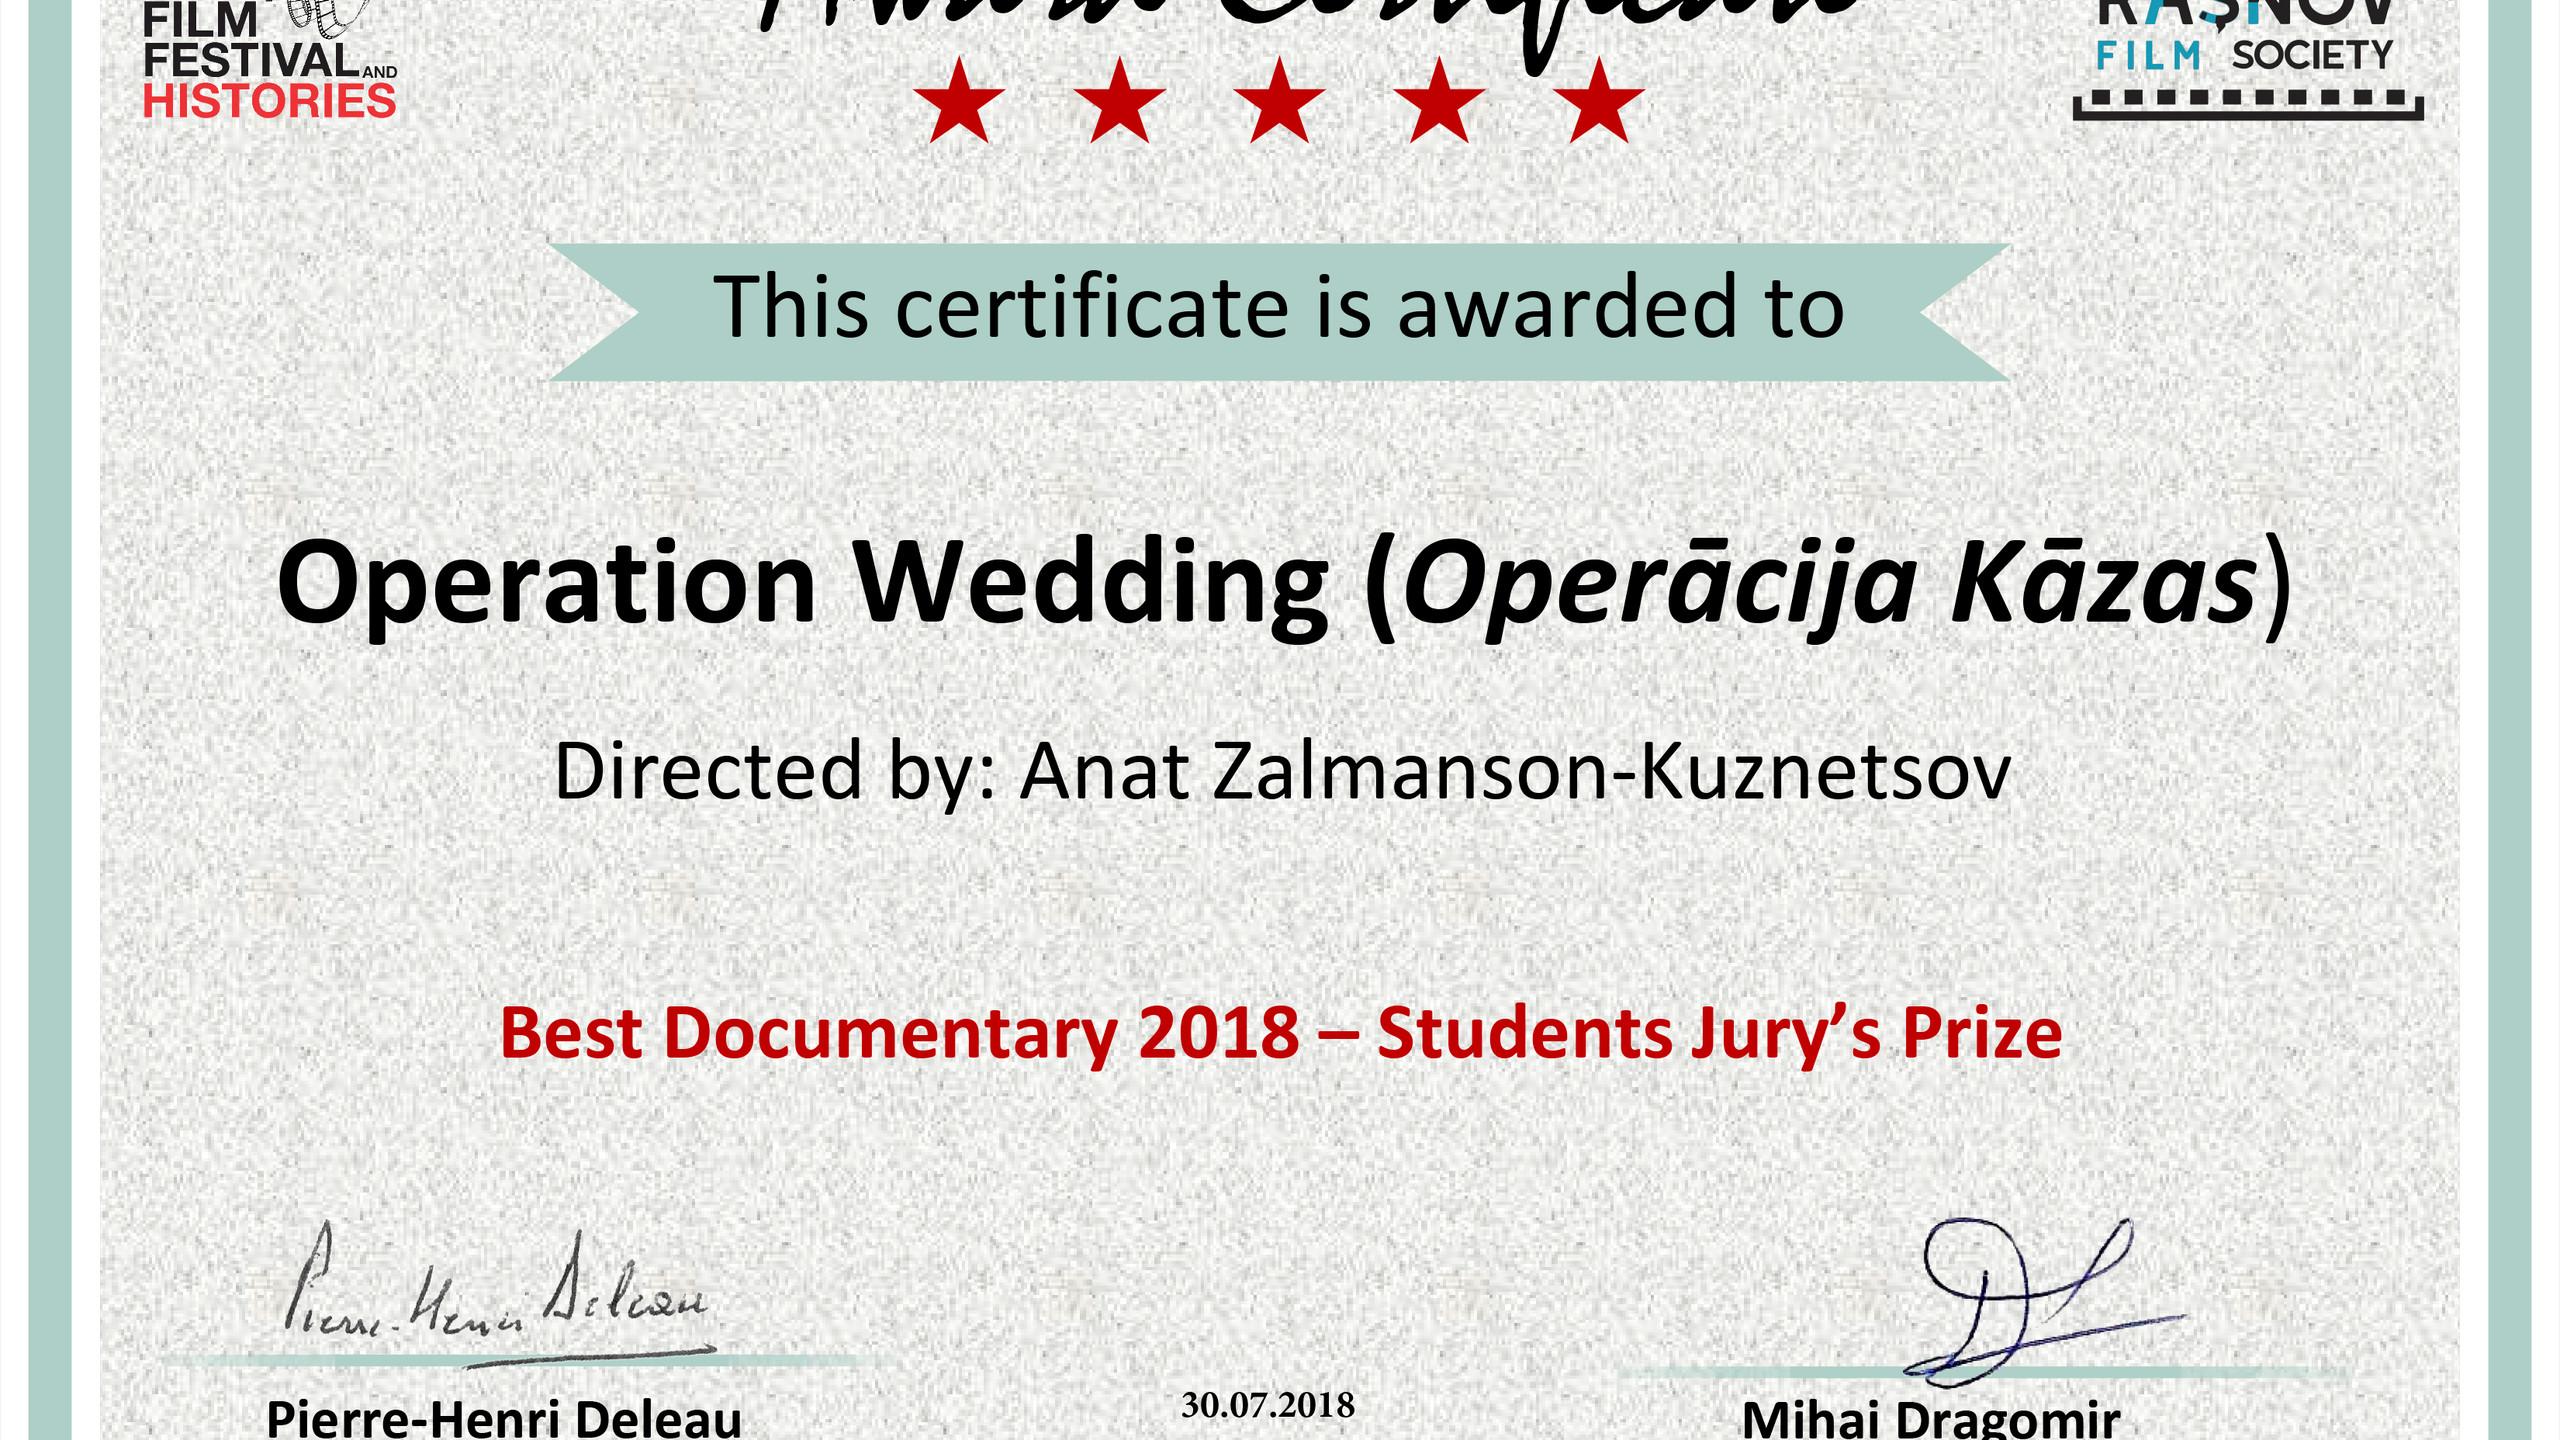 Operation Wedding Certificate rasnov his